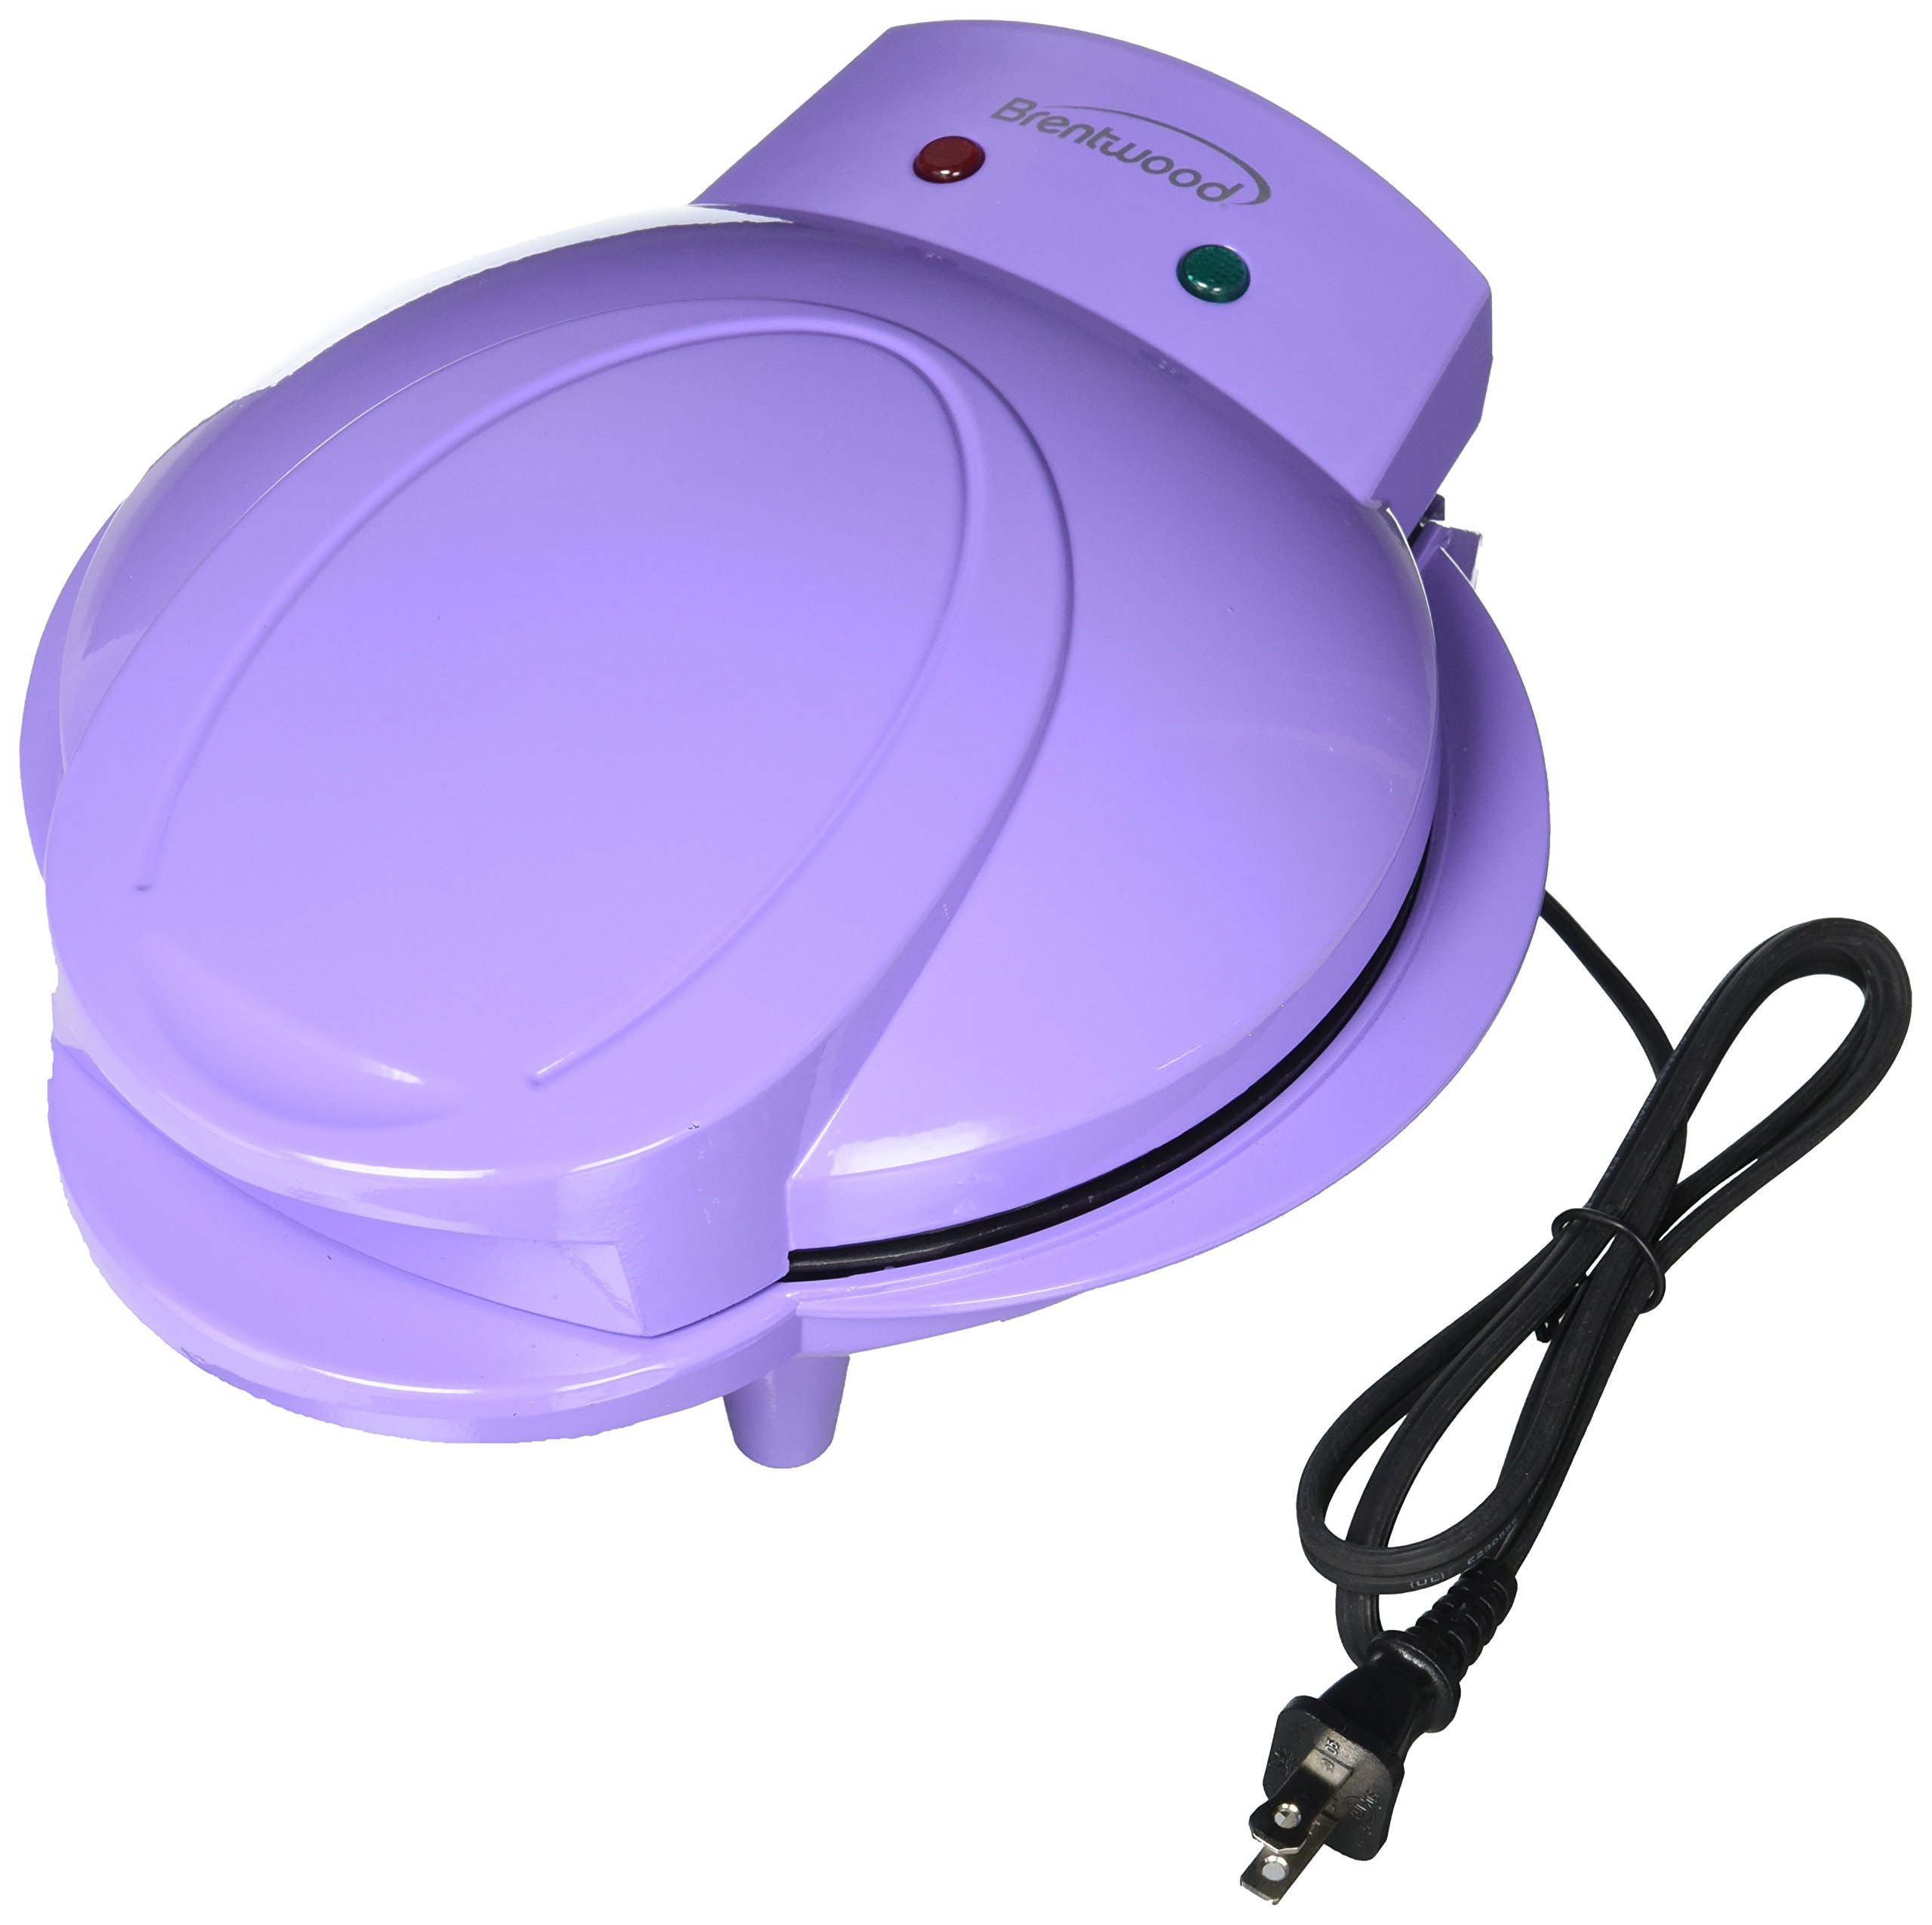 Brentwood TS-254 Cake Pop Maker Non-Stick, 12, Purple